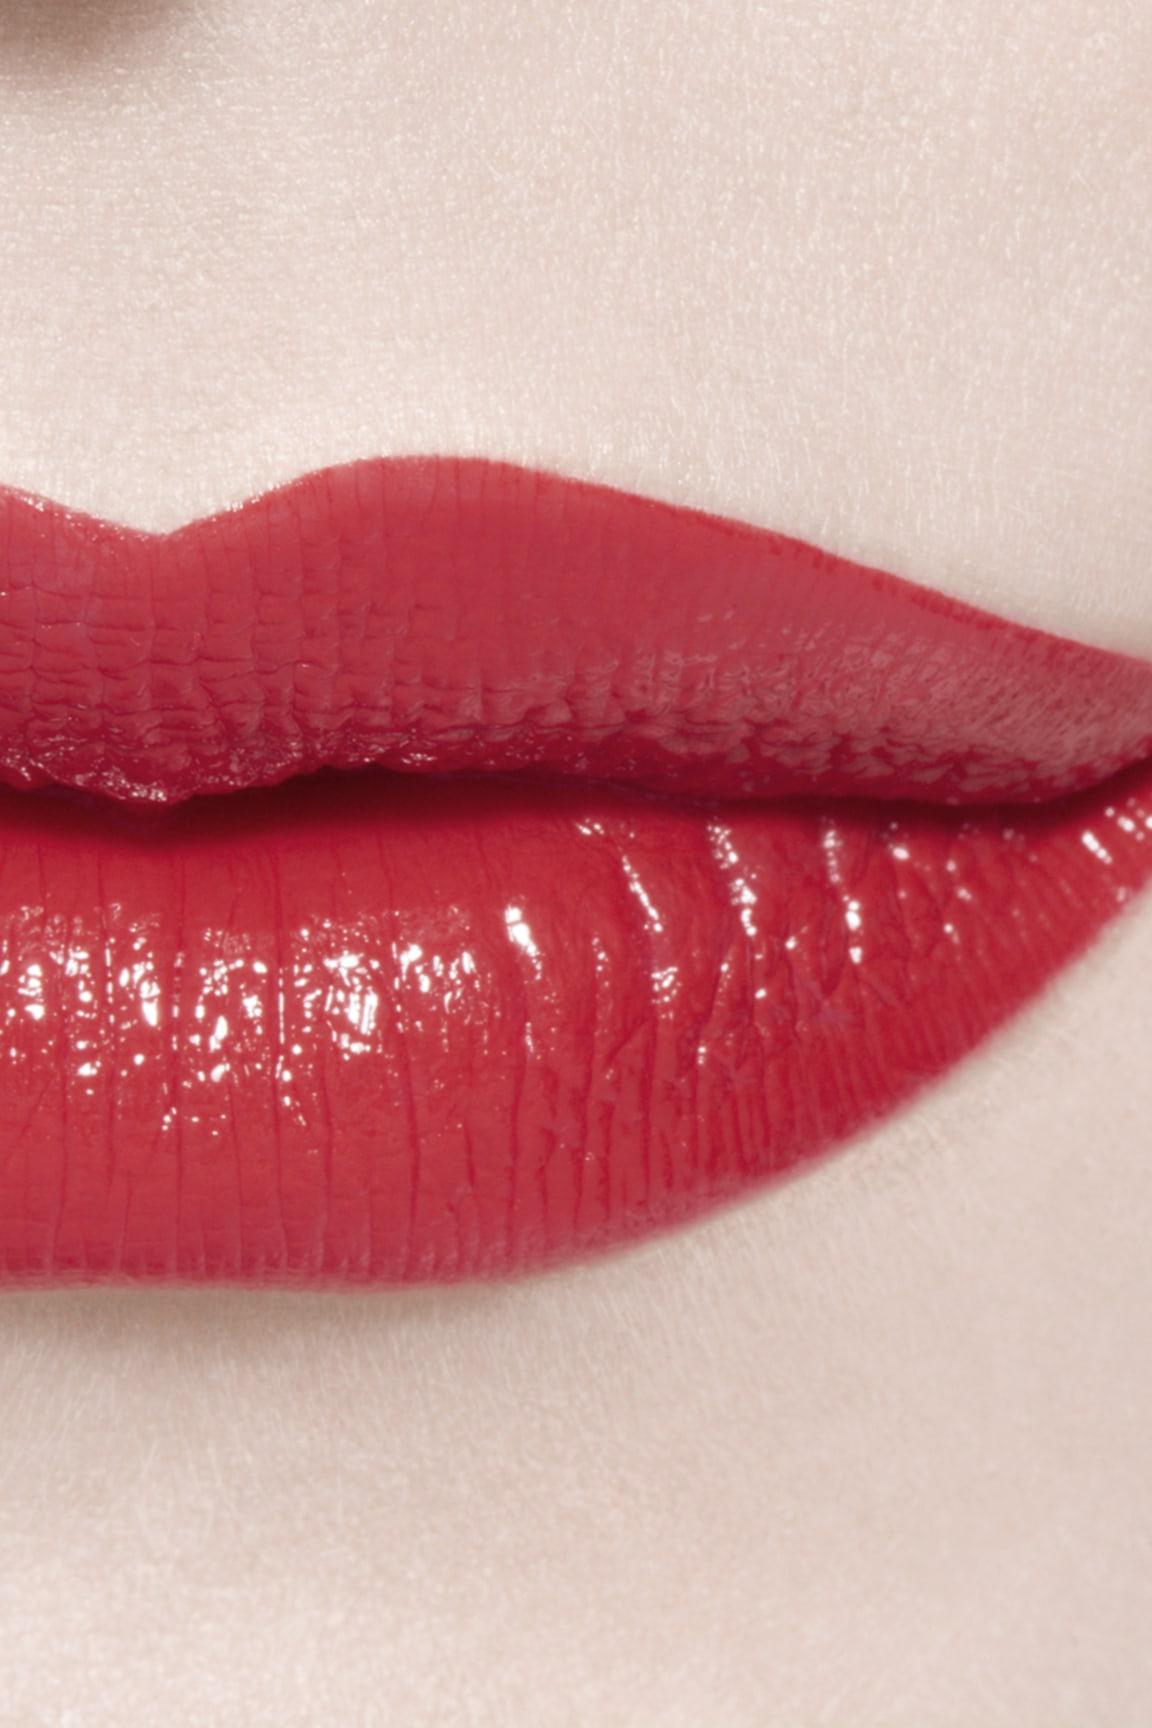 Application makeup visual 3 - ROUGE COCO BLOOM 132 - VIVACITY